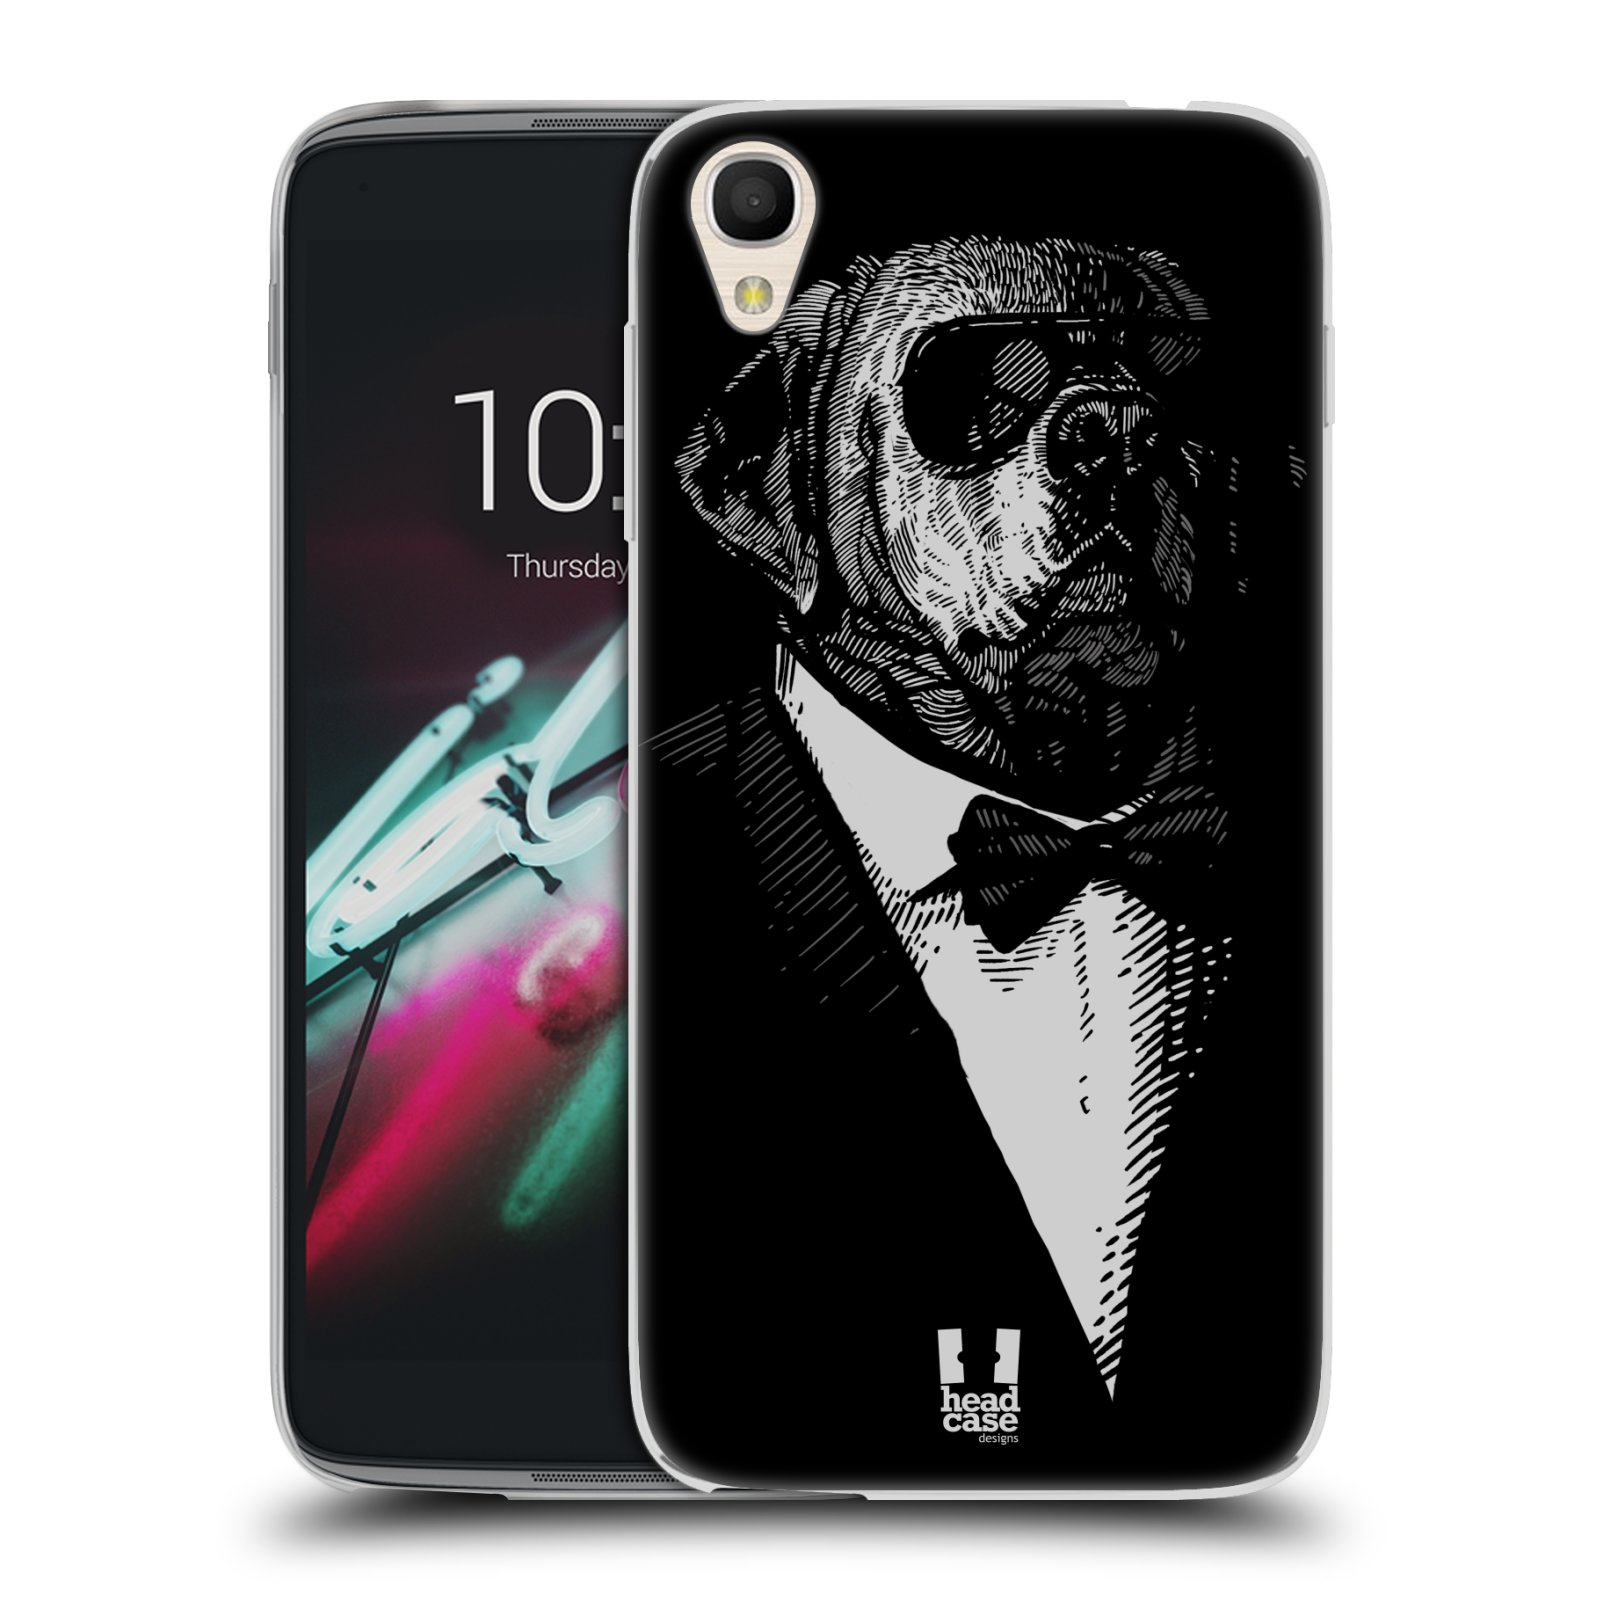 "Silikonové pouzdro na mobil Alcatel One Touch 6039Y Idol 3 HEAD CASE PSISKO V KVÁDRU (Silikonový kryt či obal na mobilní telefon Alcatel One Touch Idol 3 OT-6039Y s 4,7"" displejem)"